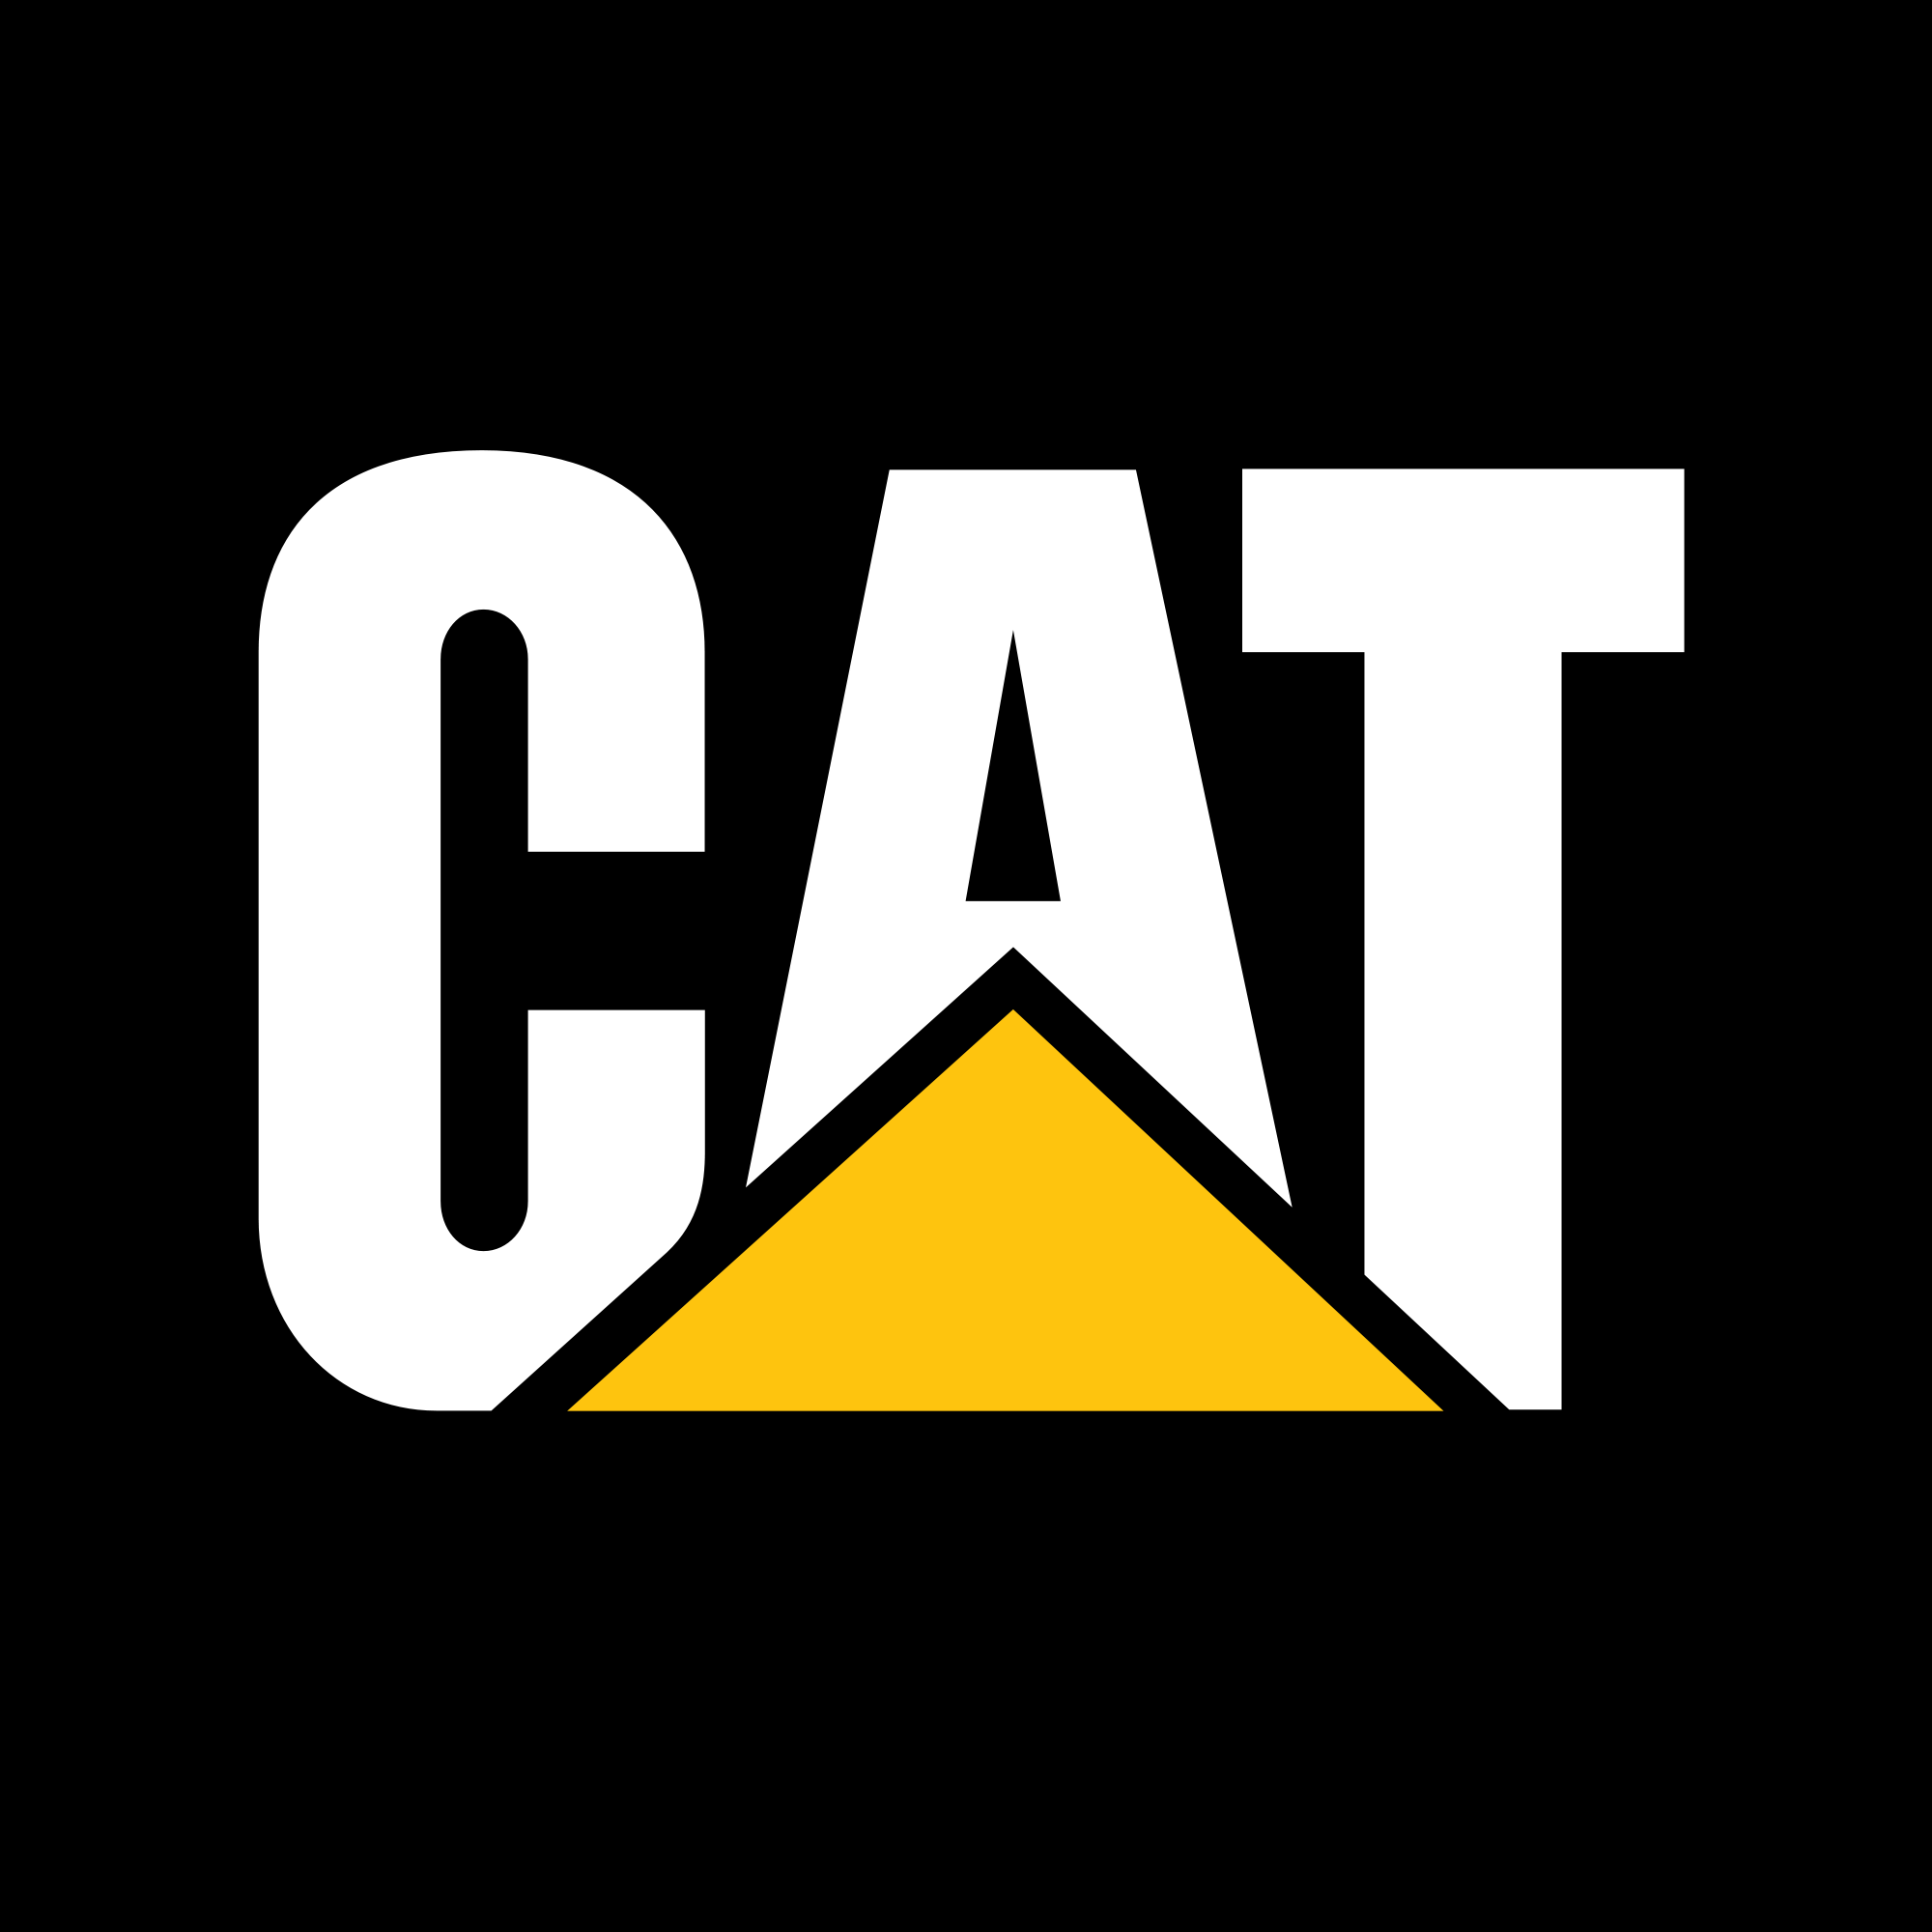 Industrials Updates: Caterpillar Inc. (CAT) Theft, General Electric Company (GE) & Algeria's ...